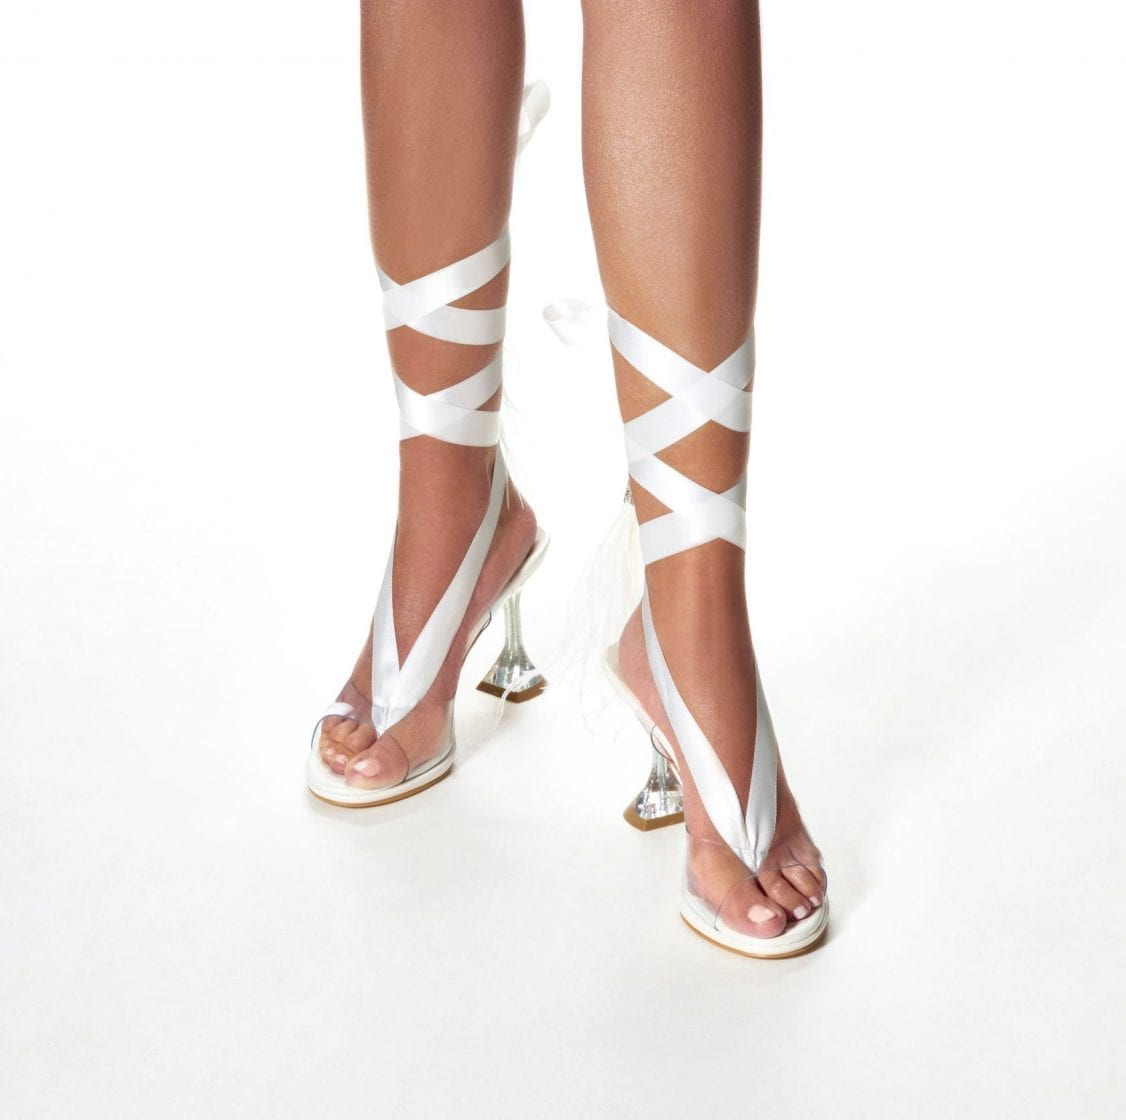 LEGS 12